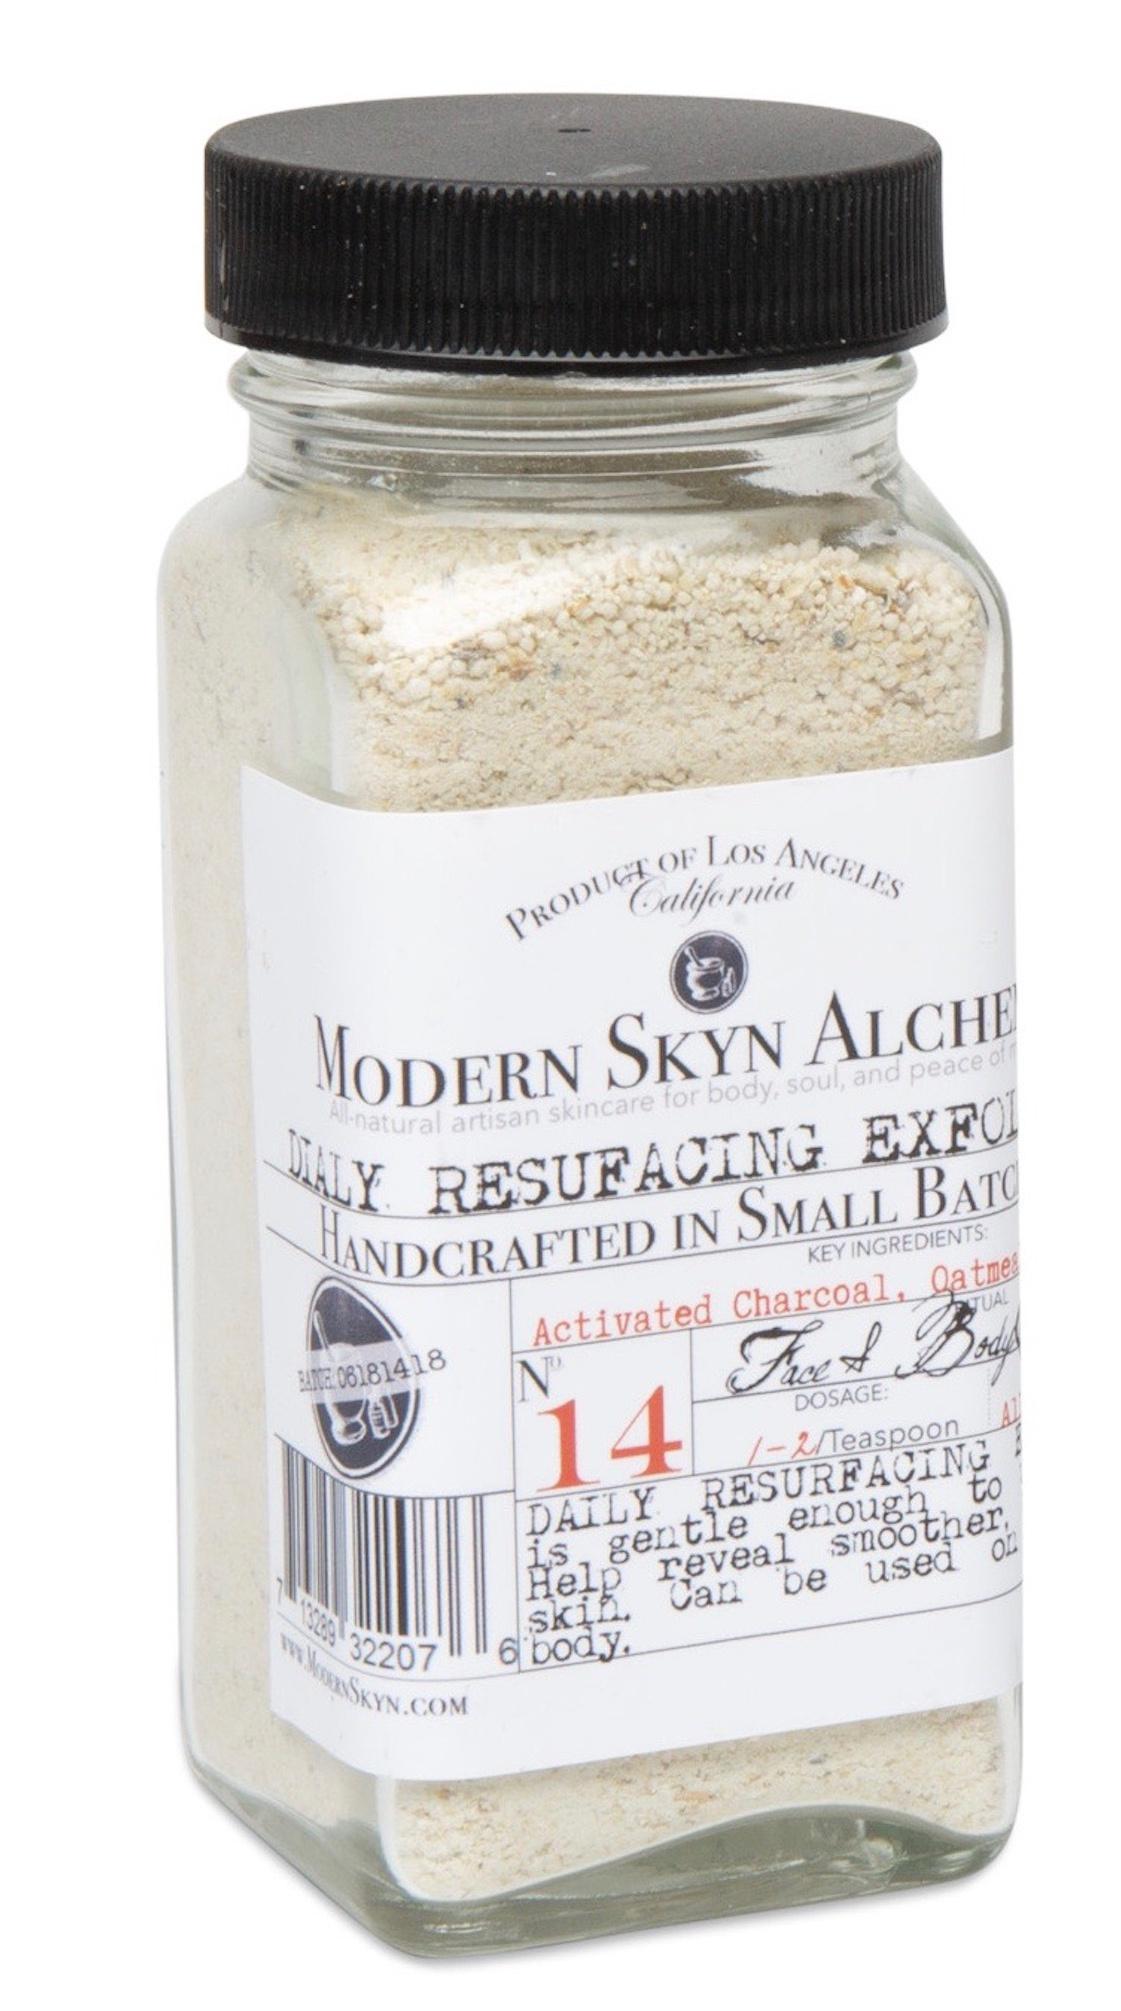 Modern Skyn Alchemy Daily Resurfacing Exfoliant